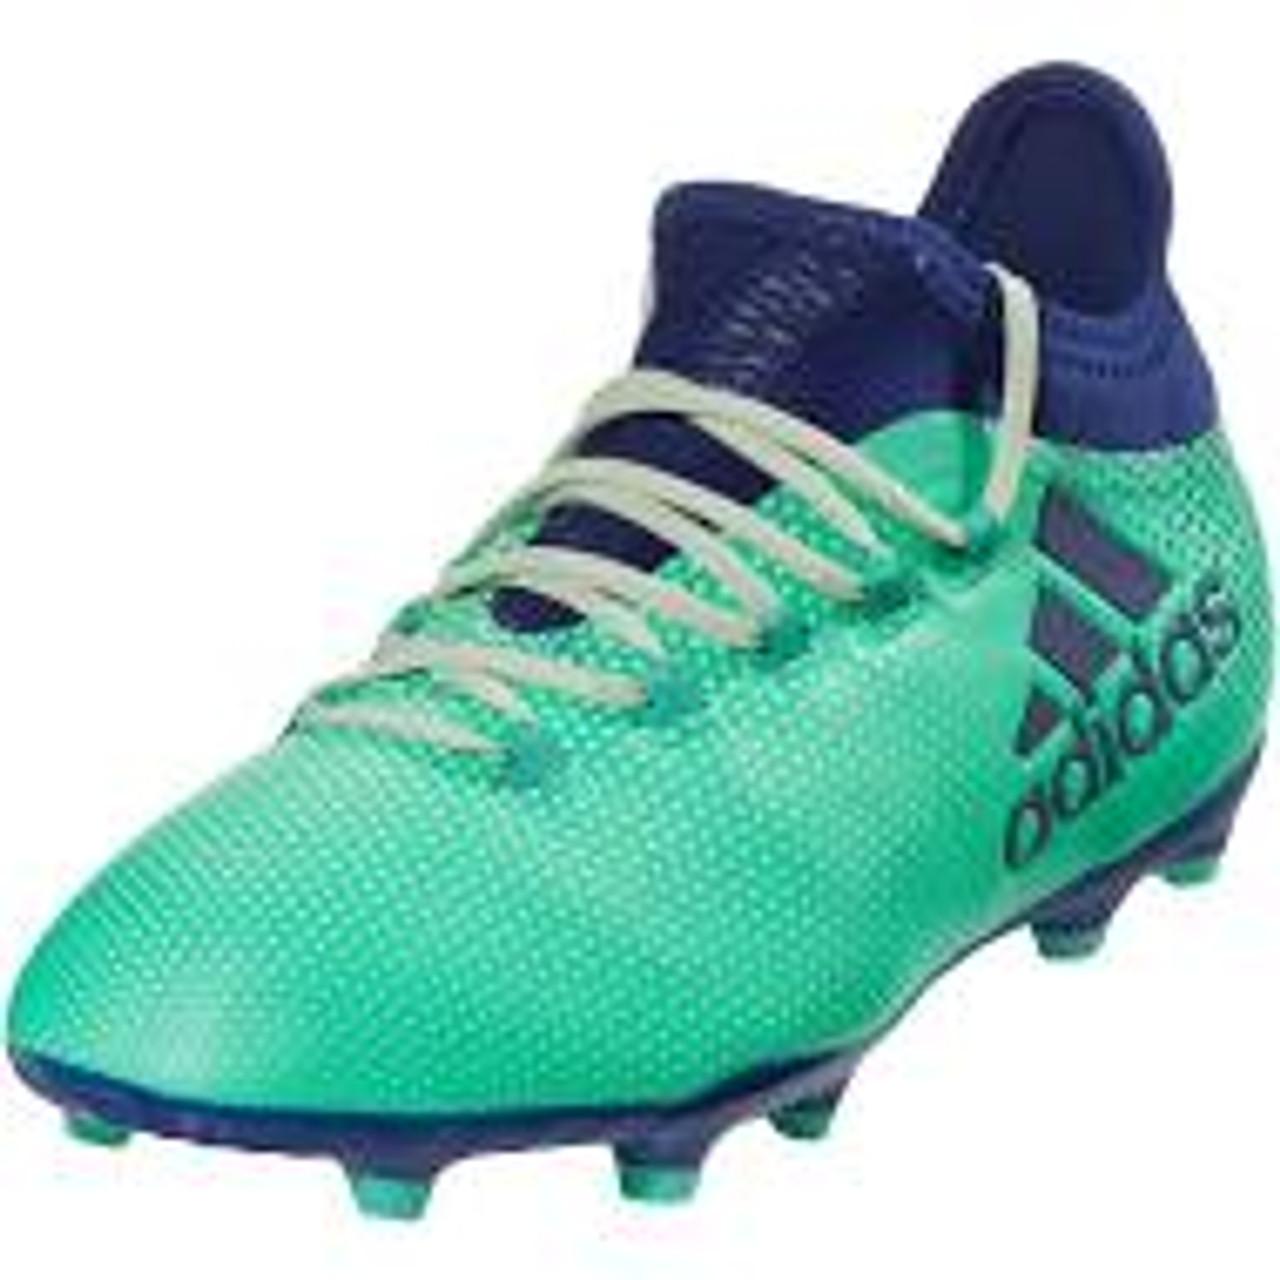 size 40 bc010 52b62 ADIDAS X 17.1 FG Junior Soccer Cleats Aero Green